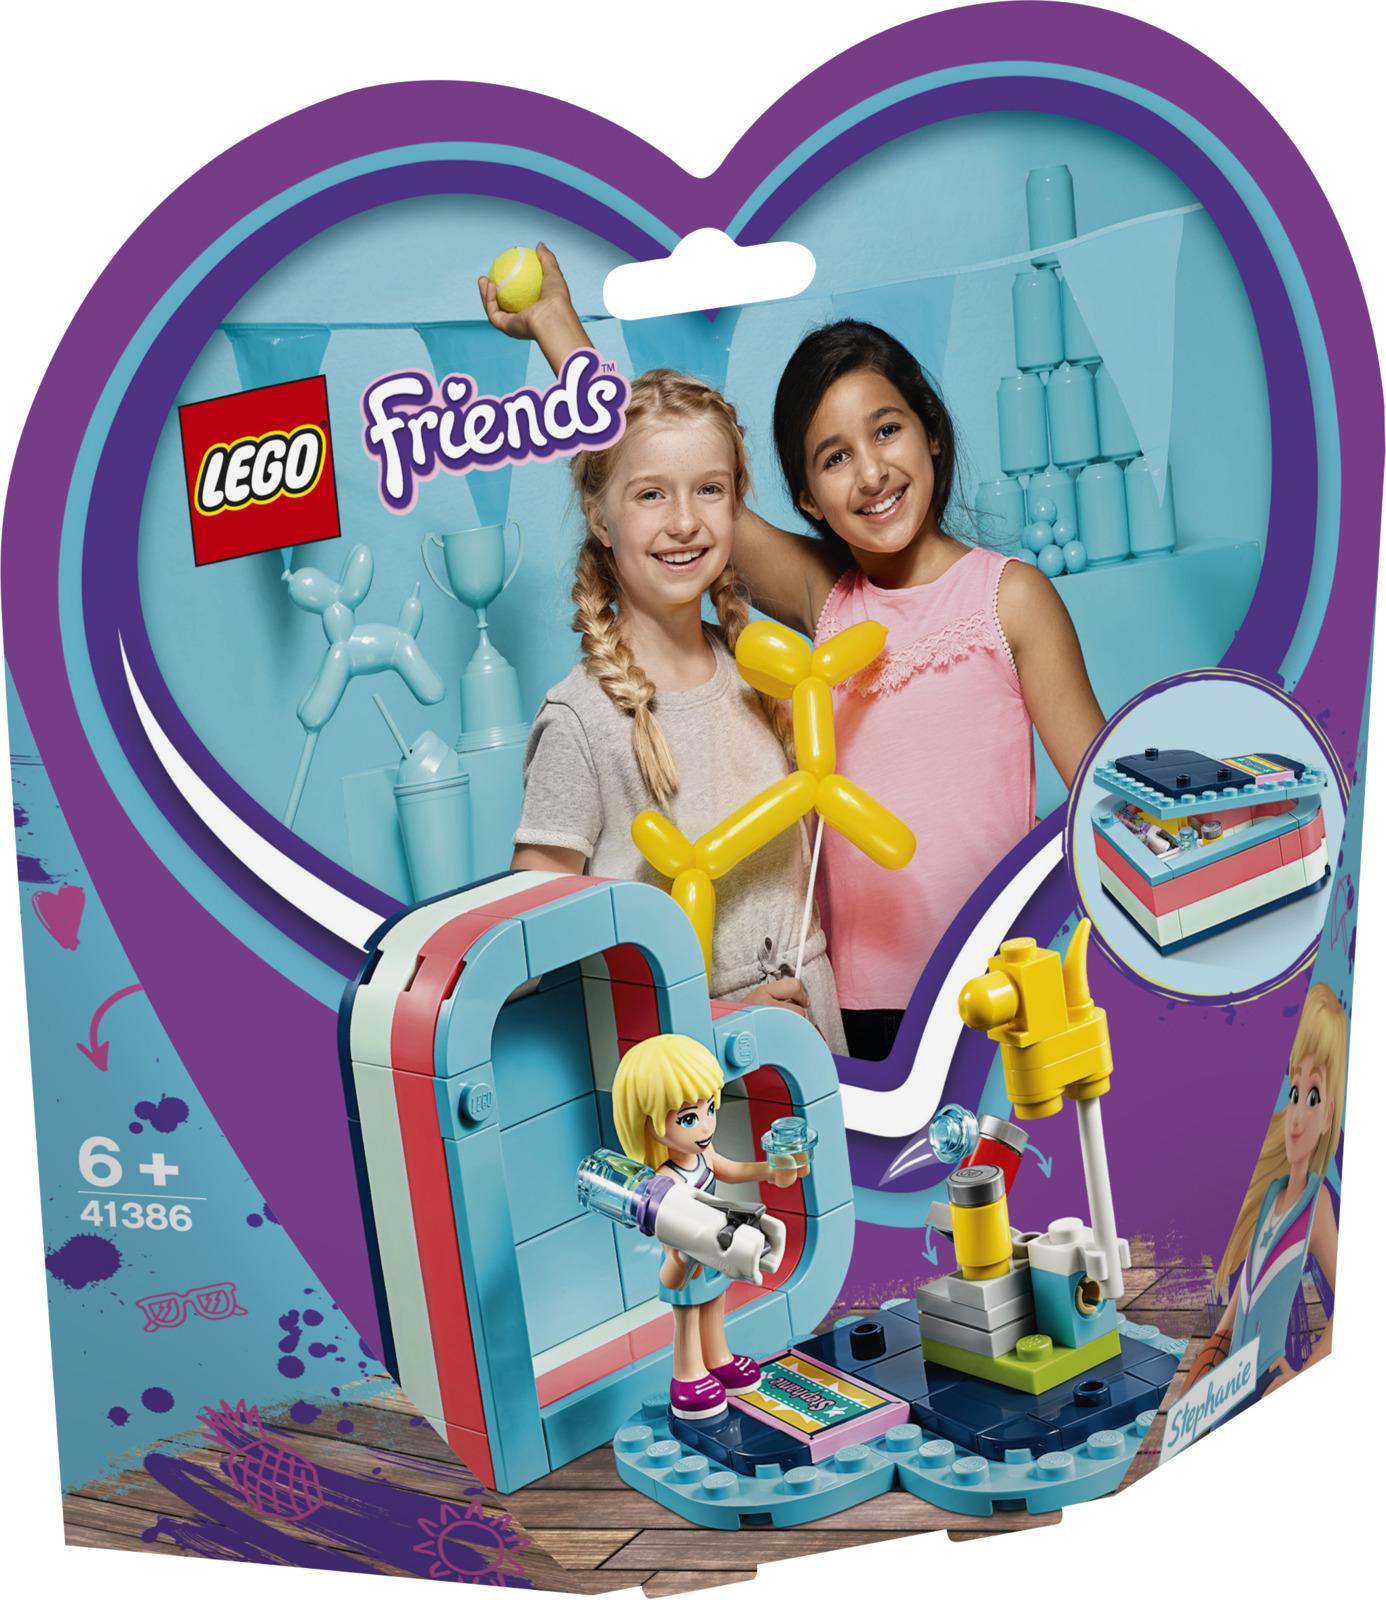 LEGO Friends 41386 Летняя шкатулка-сердечко для Стефани Конструктор конструктор lego friends 41338 спортивная арена для стефани